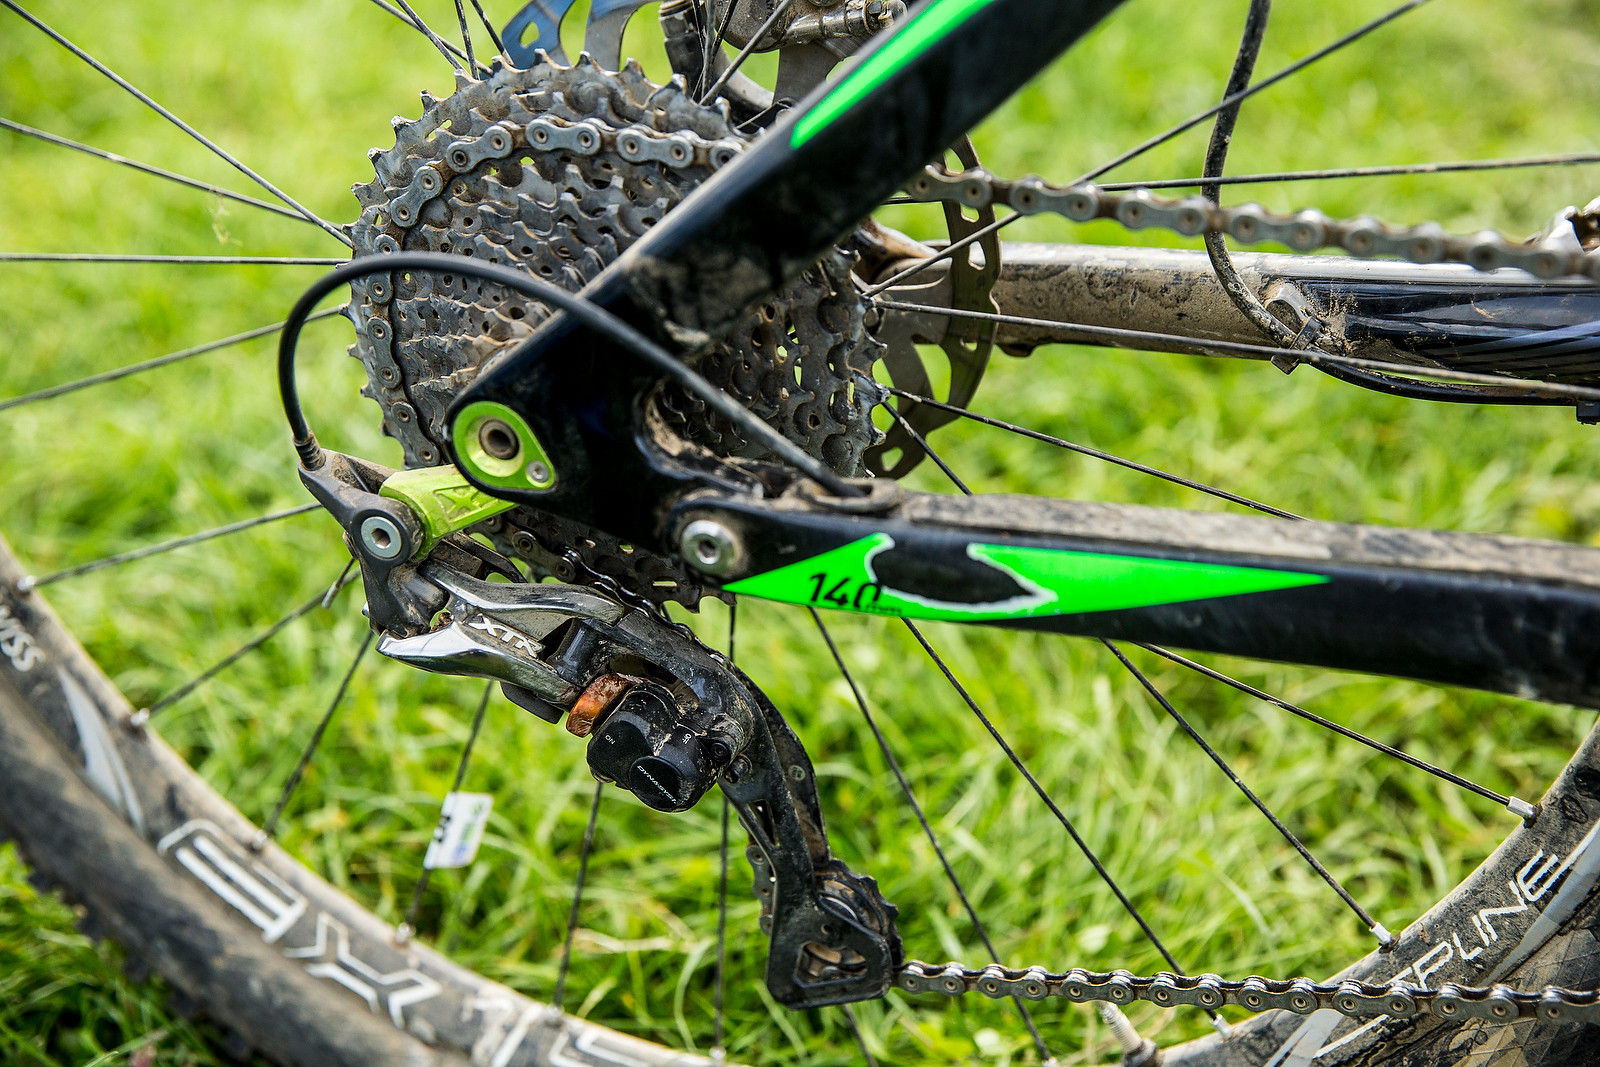 Shimano XTR Rear Derailleur - WINNING BIKE: Greg Callaghan's Cube Stereo 140 Super HPC SL 27.5 - Mountain Biking Pictures - Vital MTB